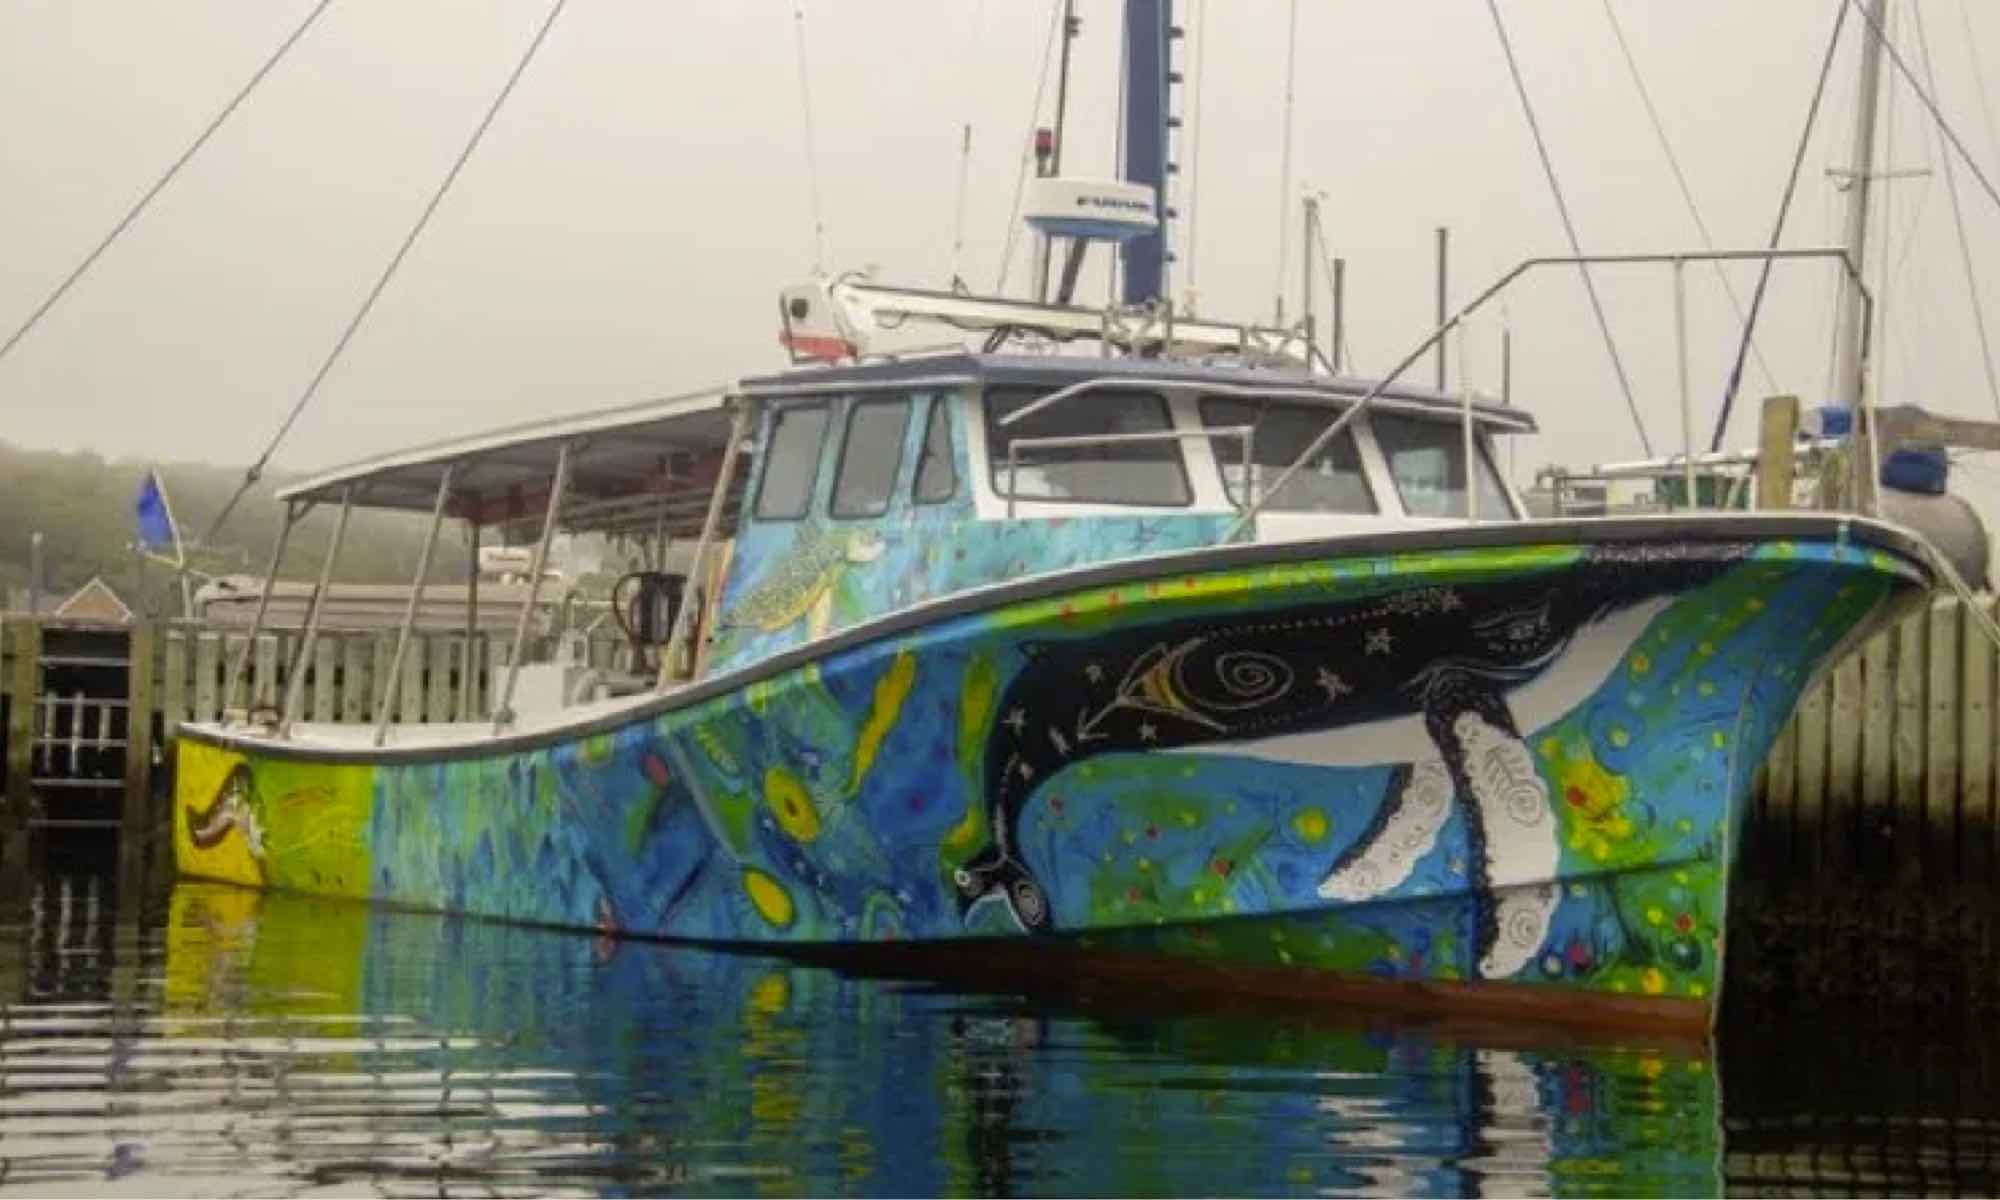 Glas Ocean electric boat Halifax